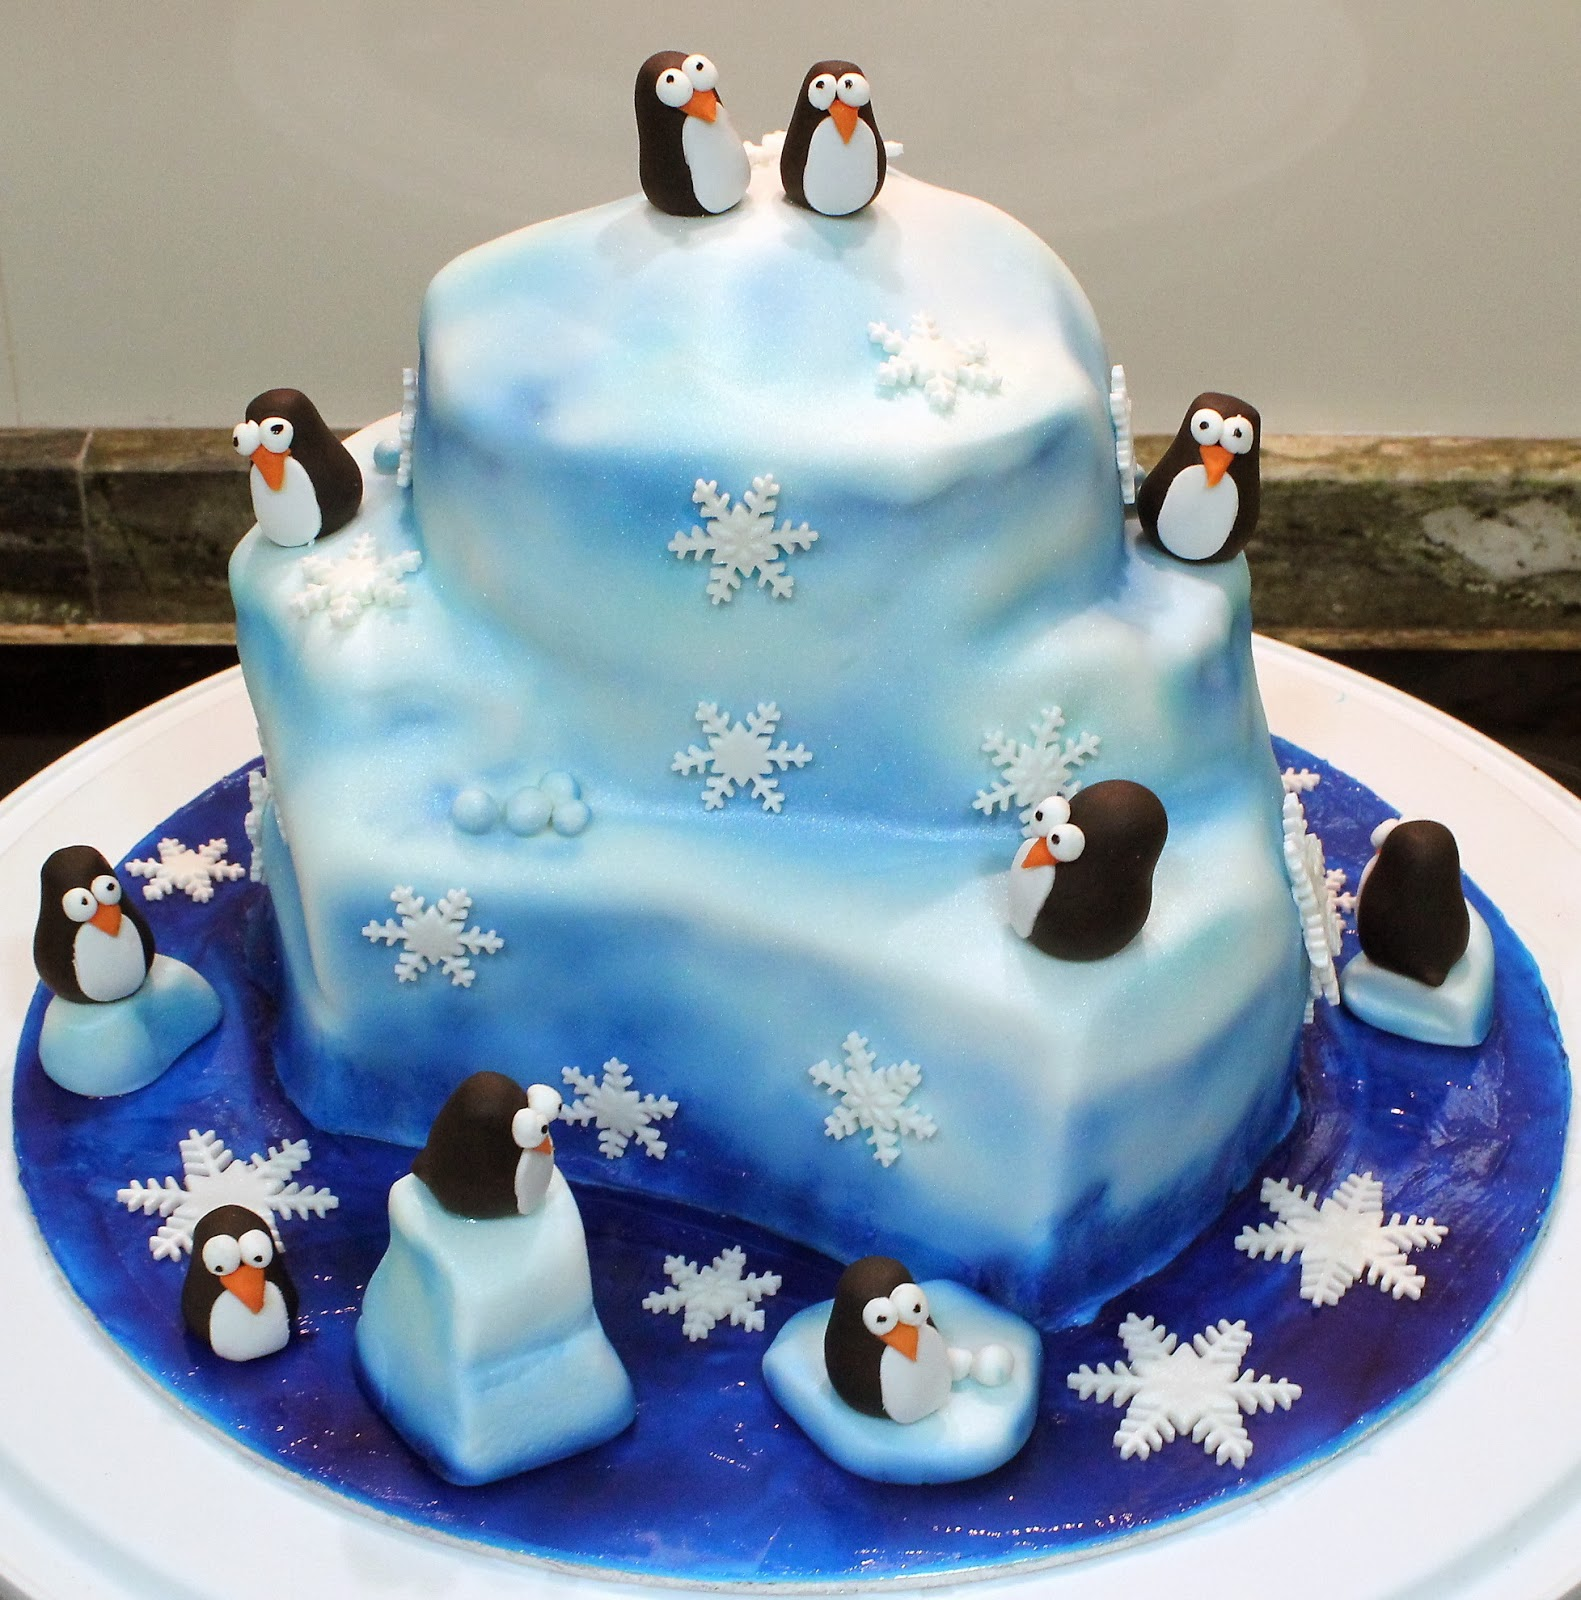 White Rose Weddings, Celebrations & Events: Penguin Theme